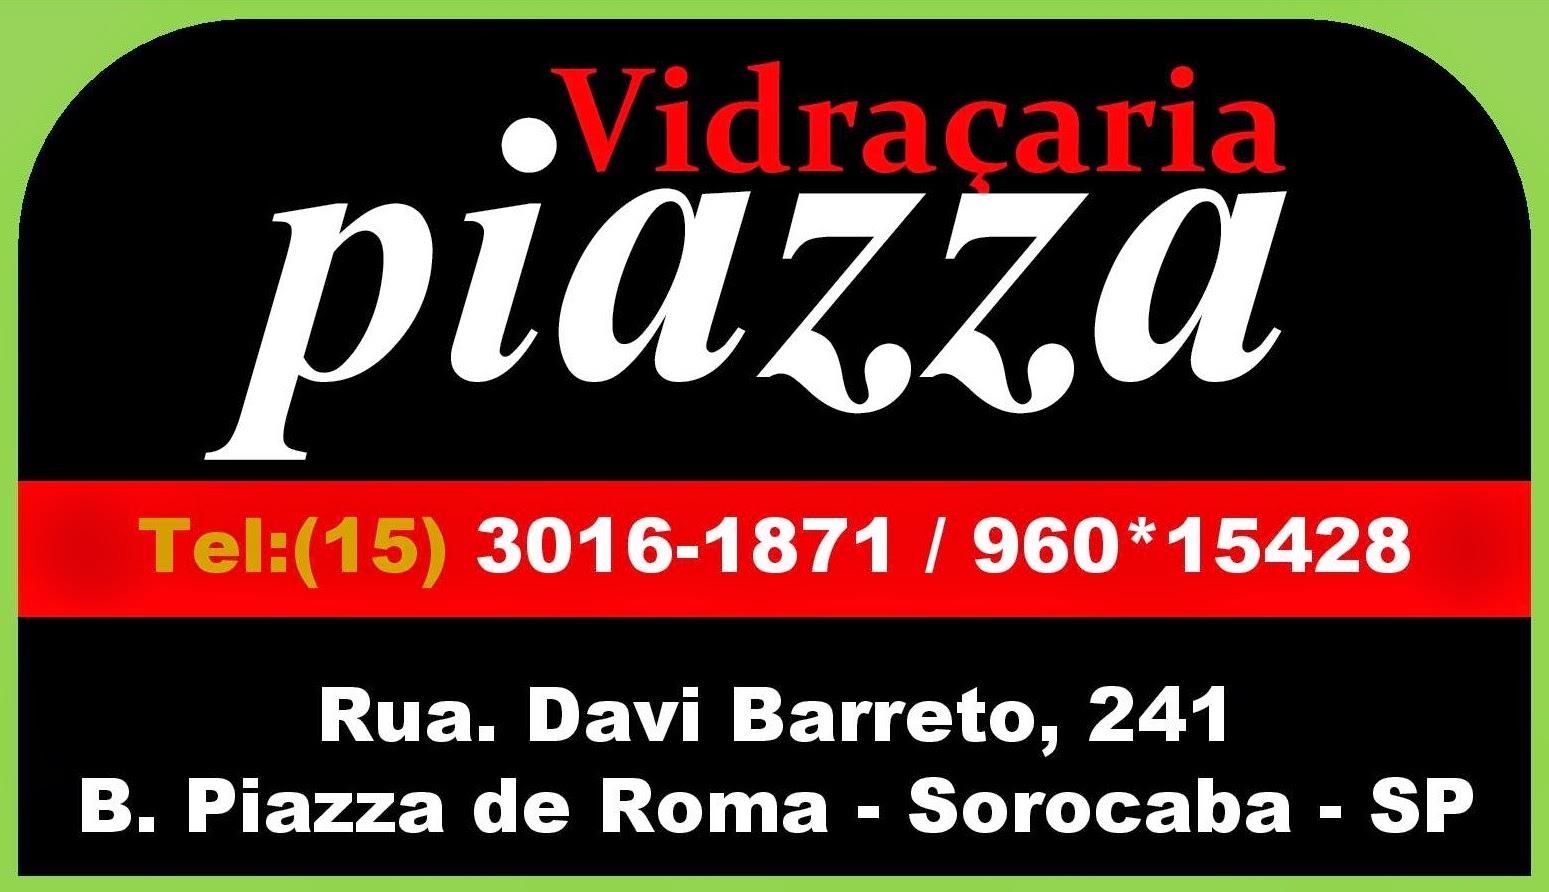 Vidraçaria Piazza Rua. Davi Barreto, 241  Piazza de Roma II - Sorocaba - SP tel: (15) 3016-1871 nextel: 960*15428